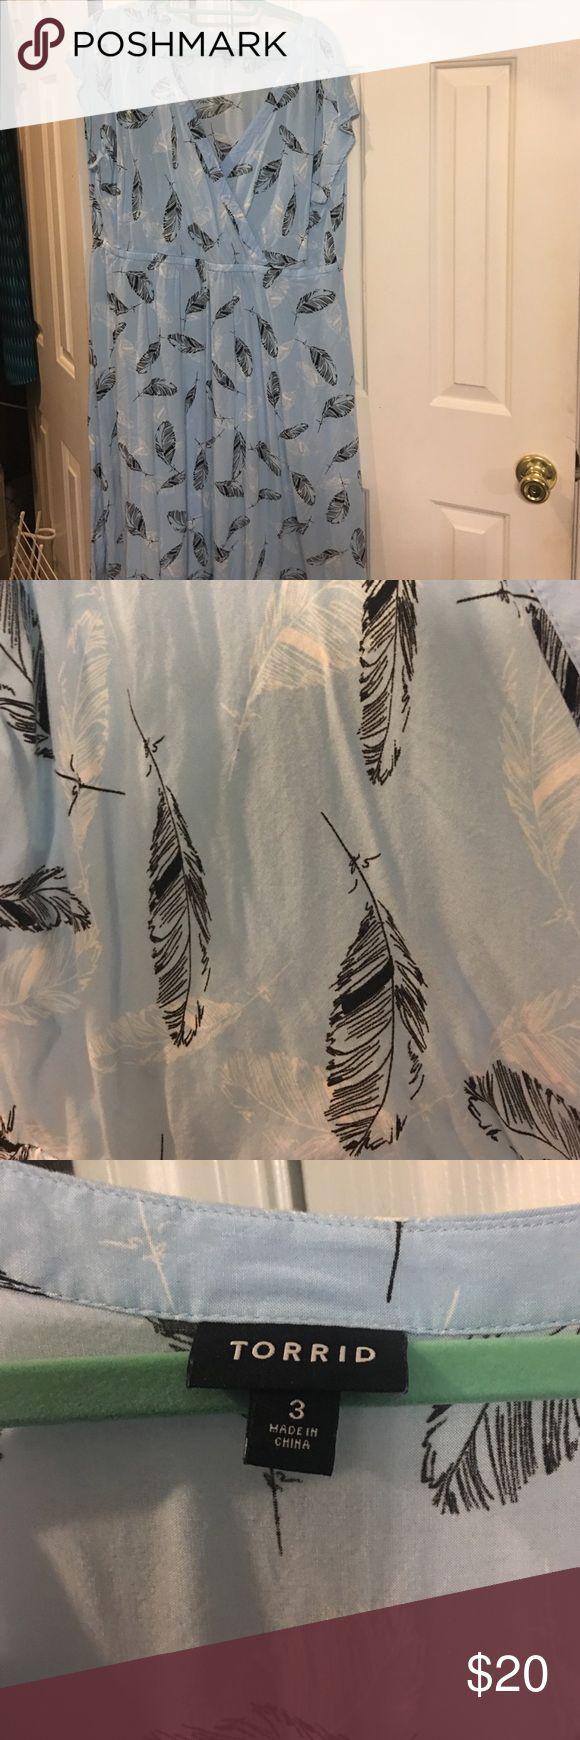 Size 3 (22/24) torrid spring dress Light blue with black and white feathers size 3 (22/24) torrid spring 👗 torrid Dresses Midi